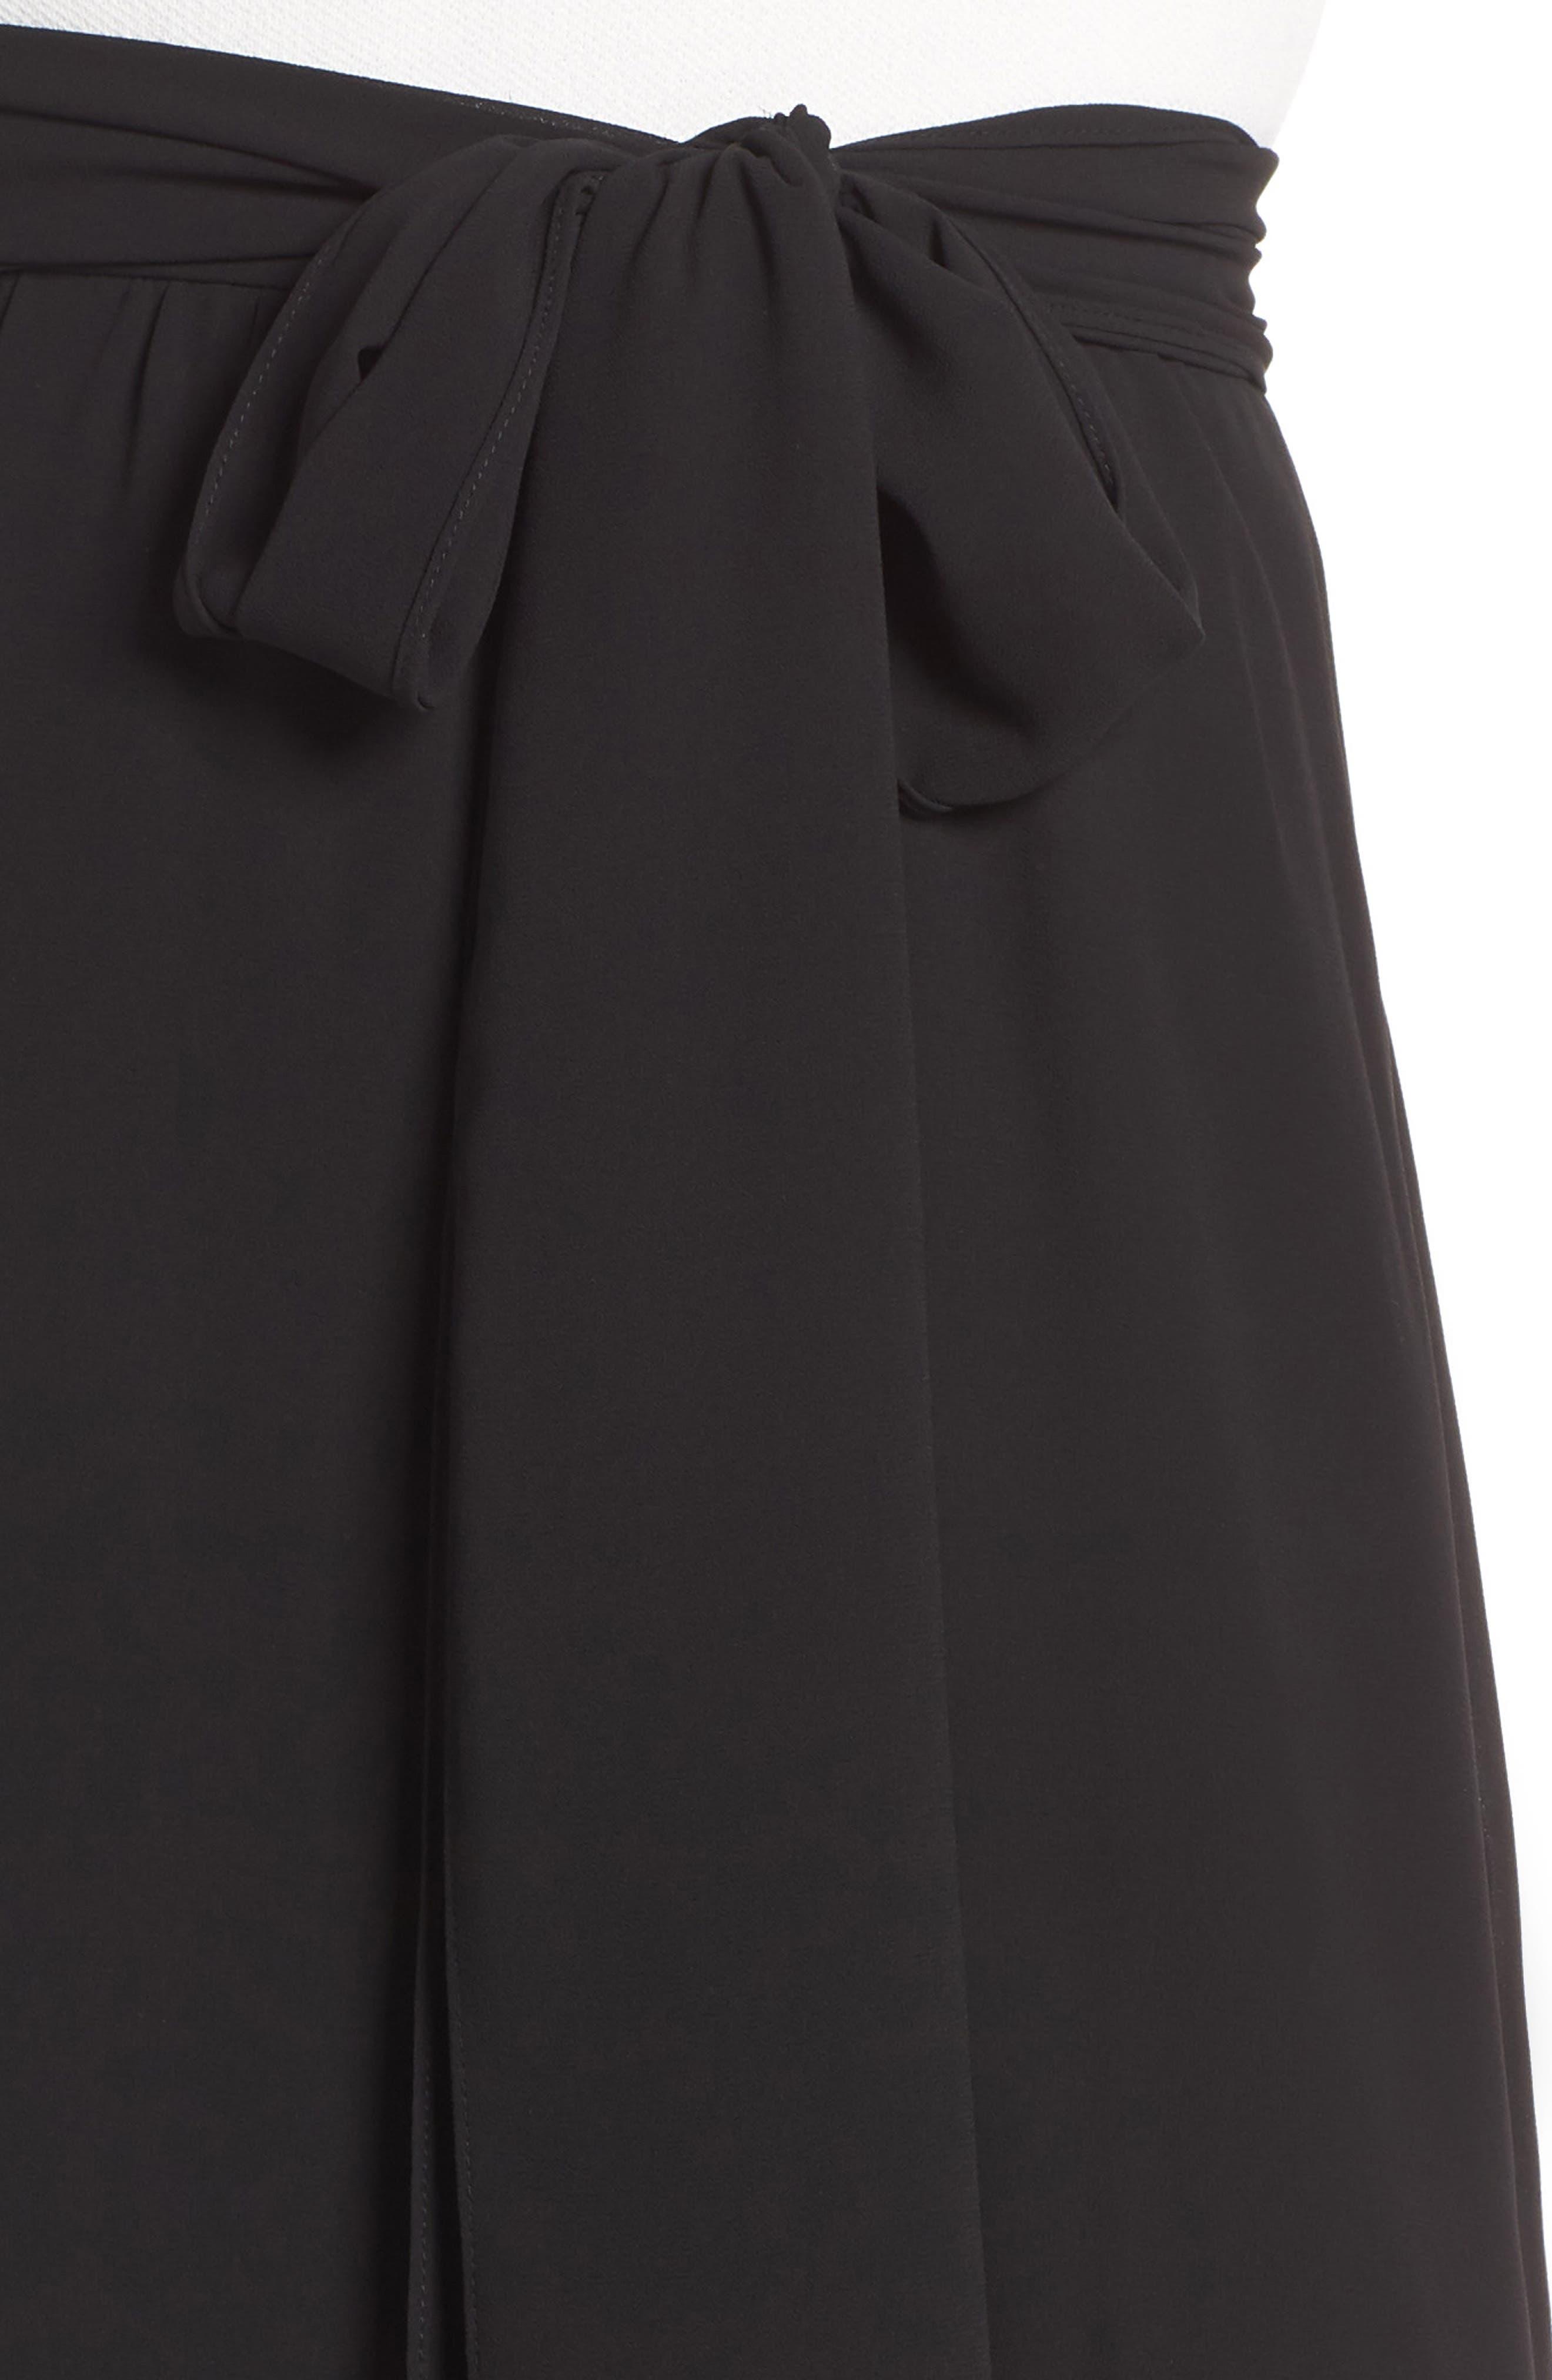 Asymmetrical High/Low Flounce Skirt,                             Alternate thumbnail 4, color,                             Black